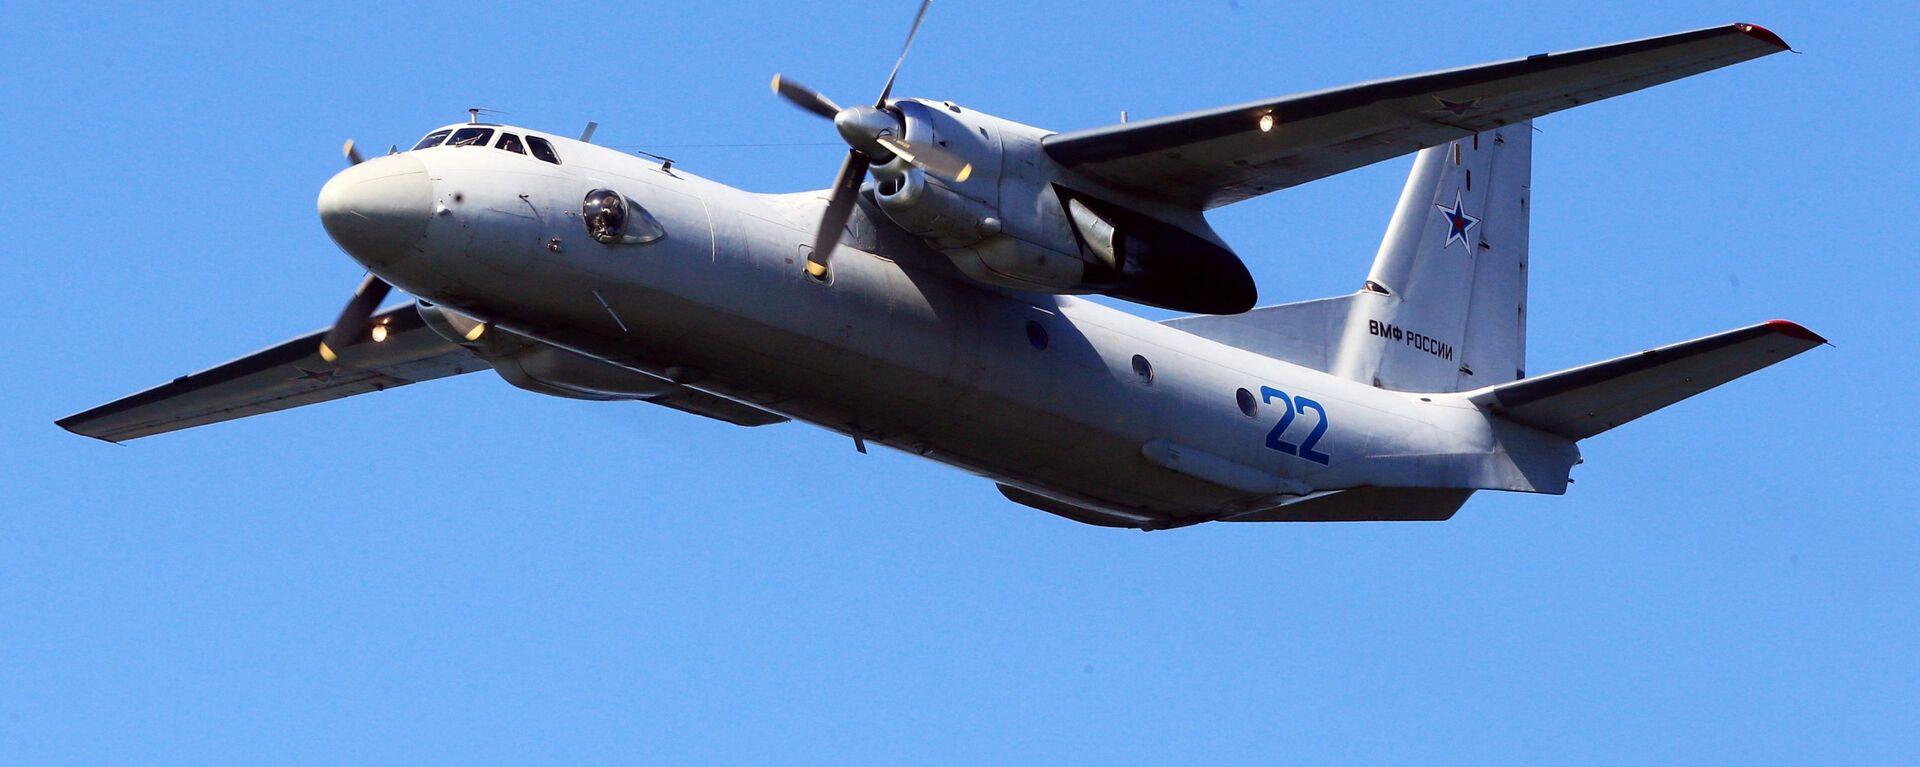 Samolot An-26 - Sputnik Polska, 1920, 06.07.2021